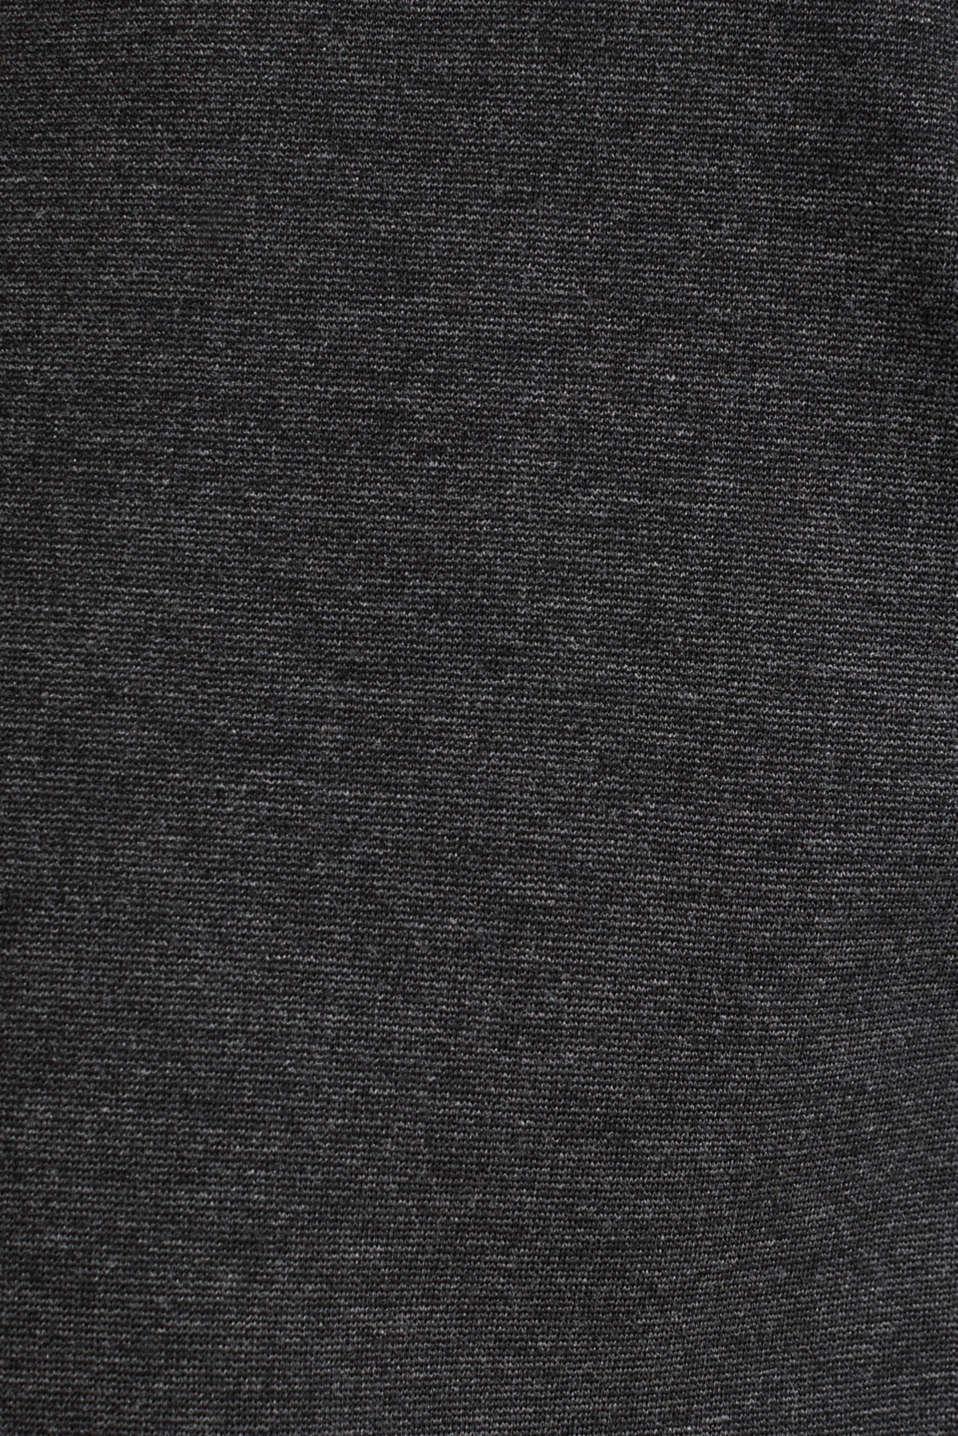 Stretch jersey blazer with pockets, DARK GREY, detail image number 4